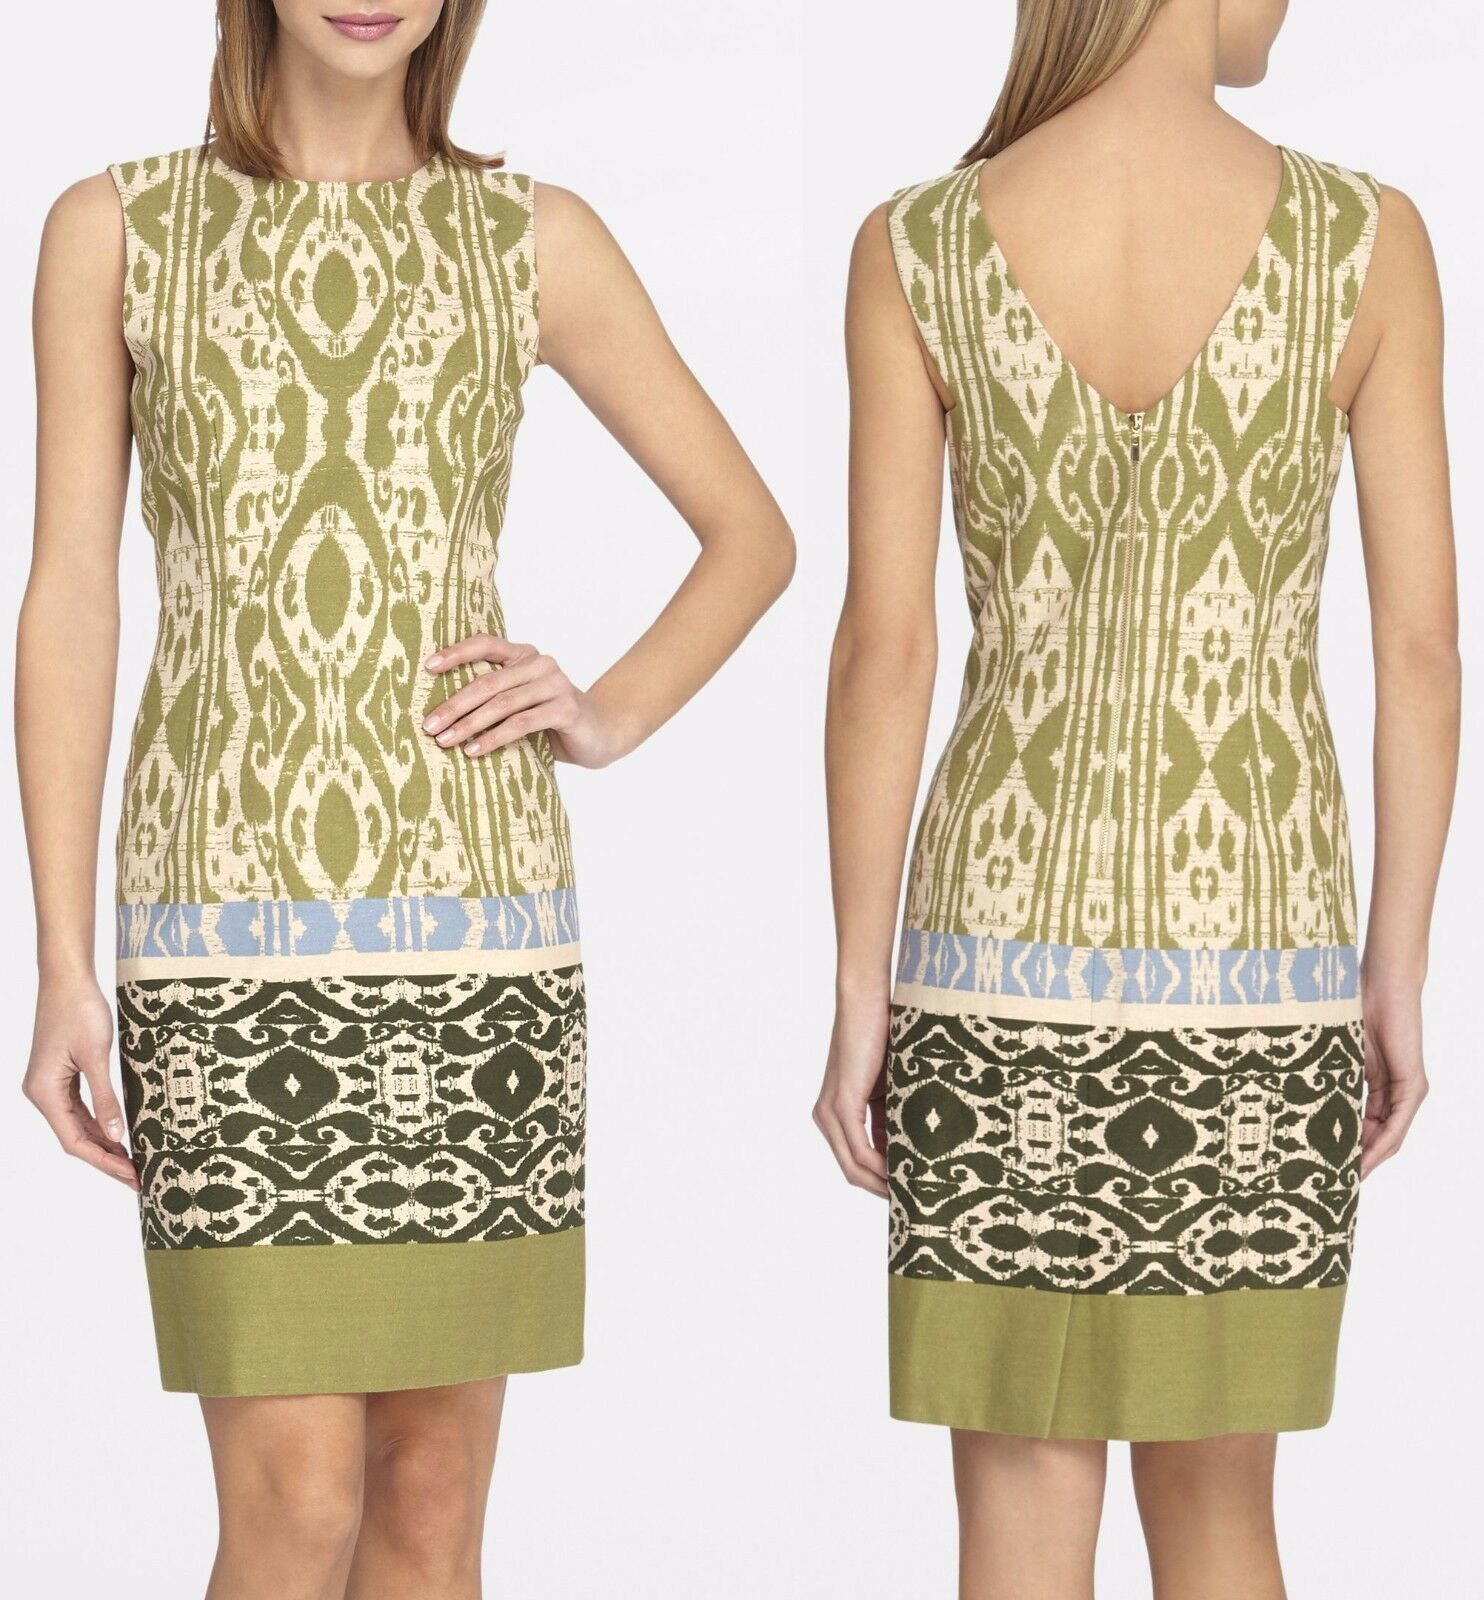 Tahari 6220M397 Natural/Olive/Peri Boho-Inspired V-Back Linen Sheath Dress  $118